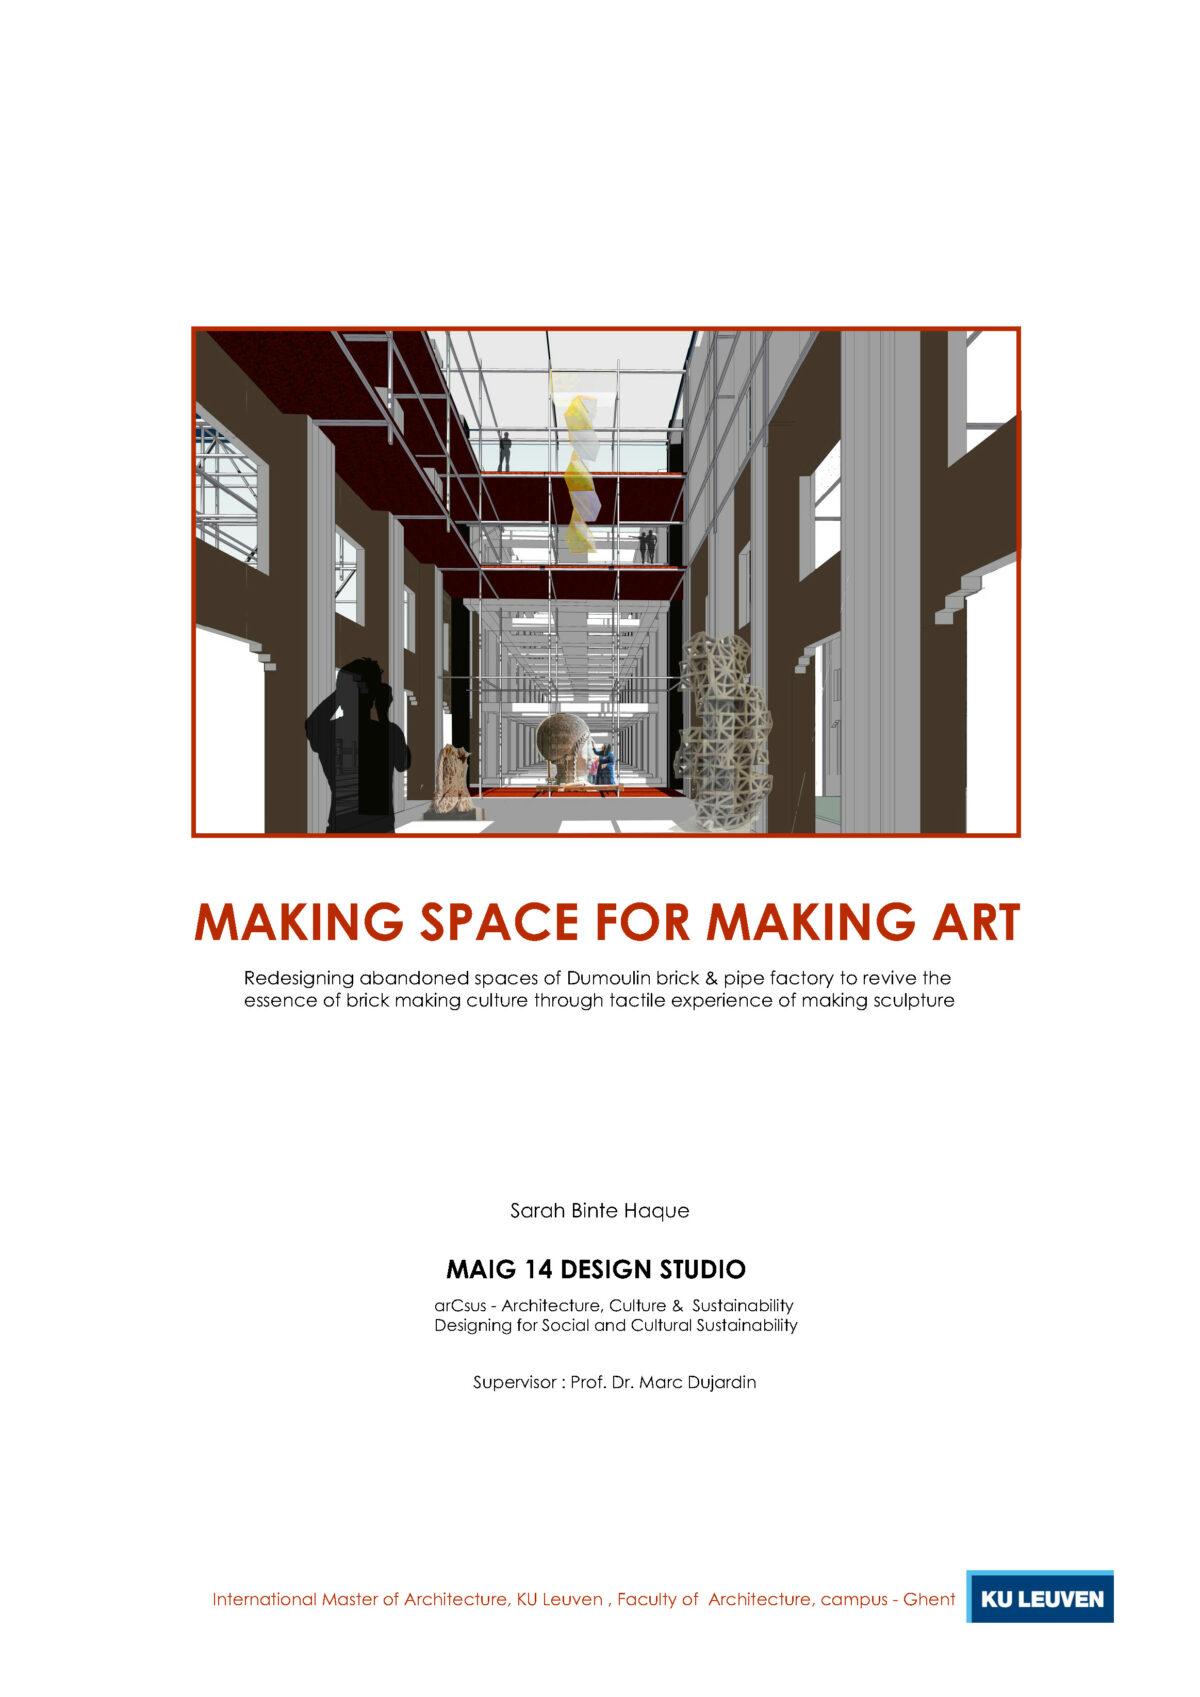 making-space-for-making-art-sae-leporello-maig14-2019-2020-1